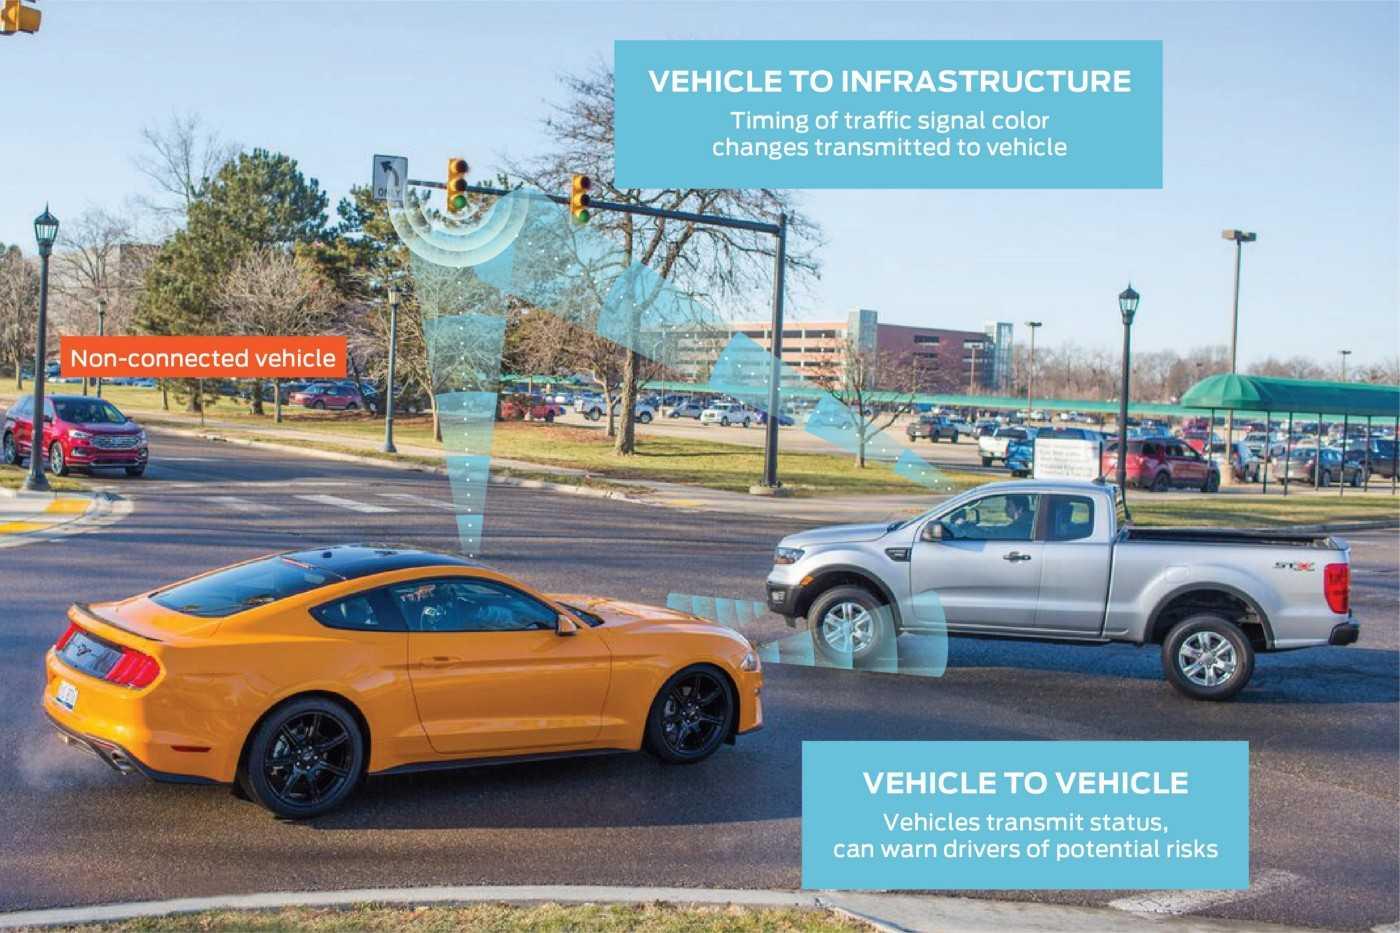 Les voitures de Ford commenceront à se parler en 2022